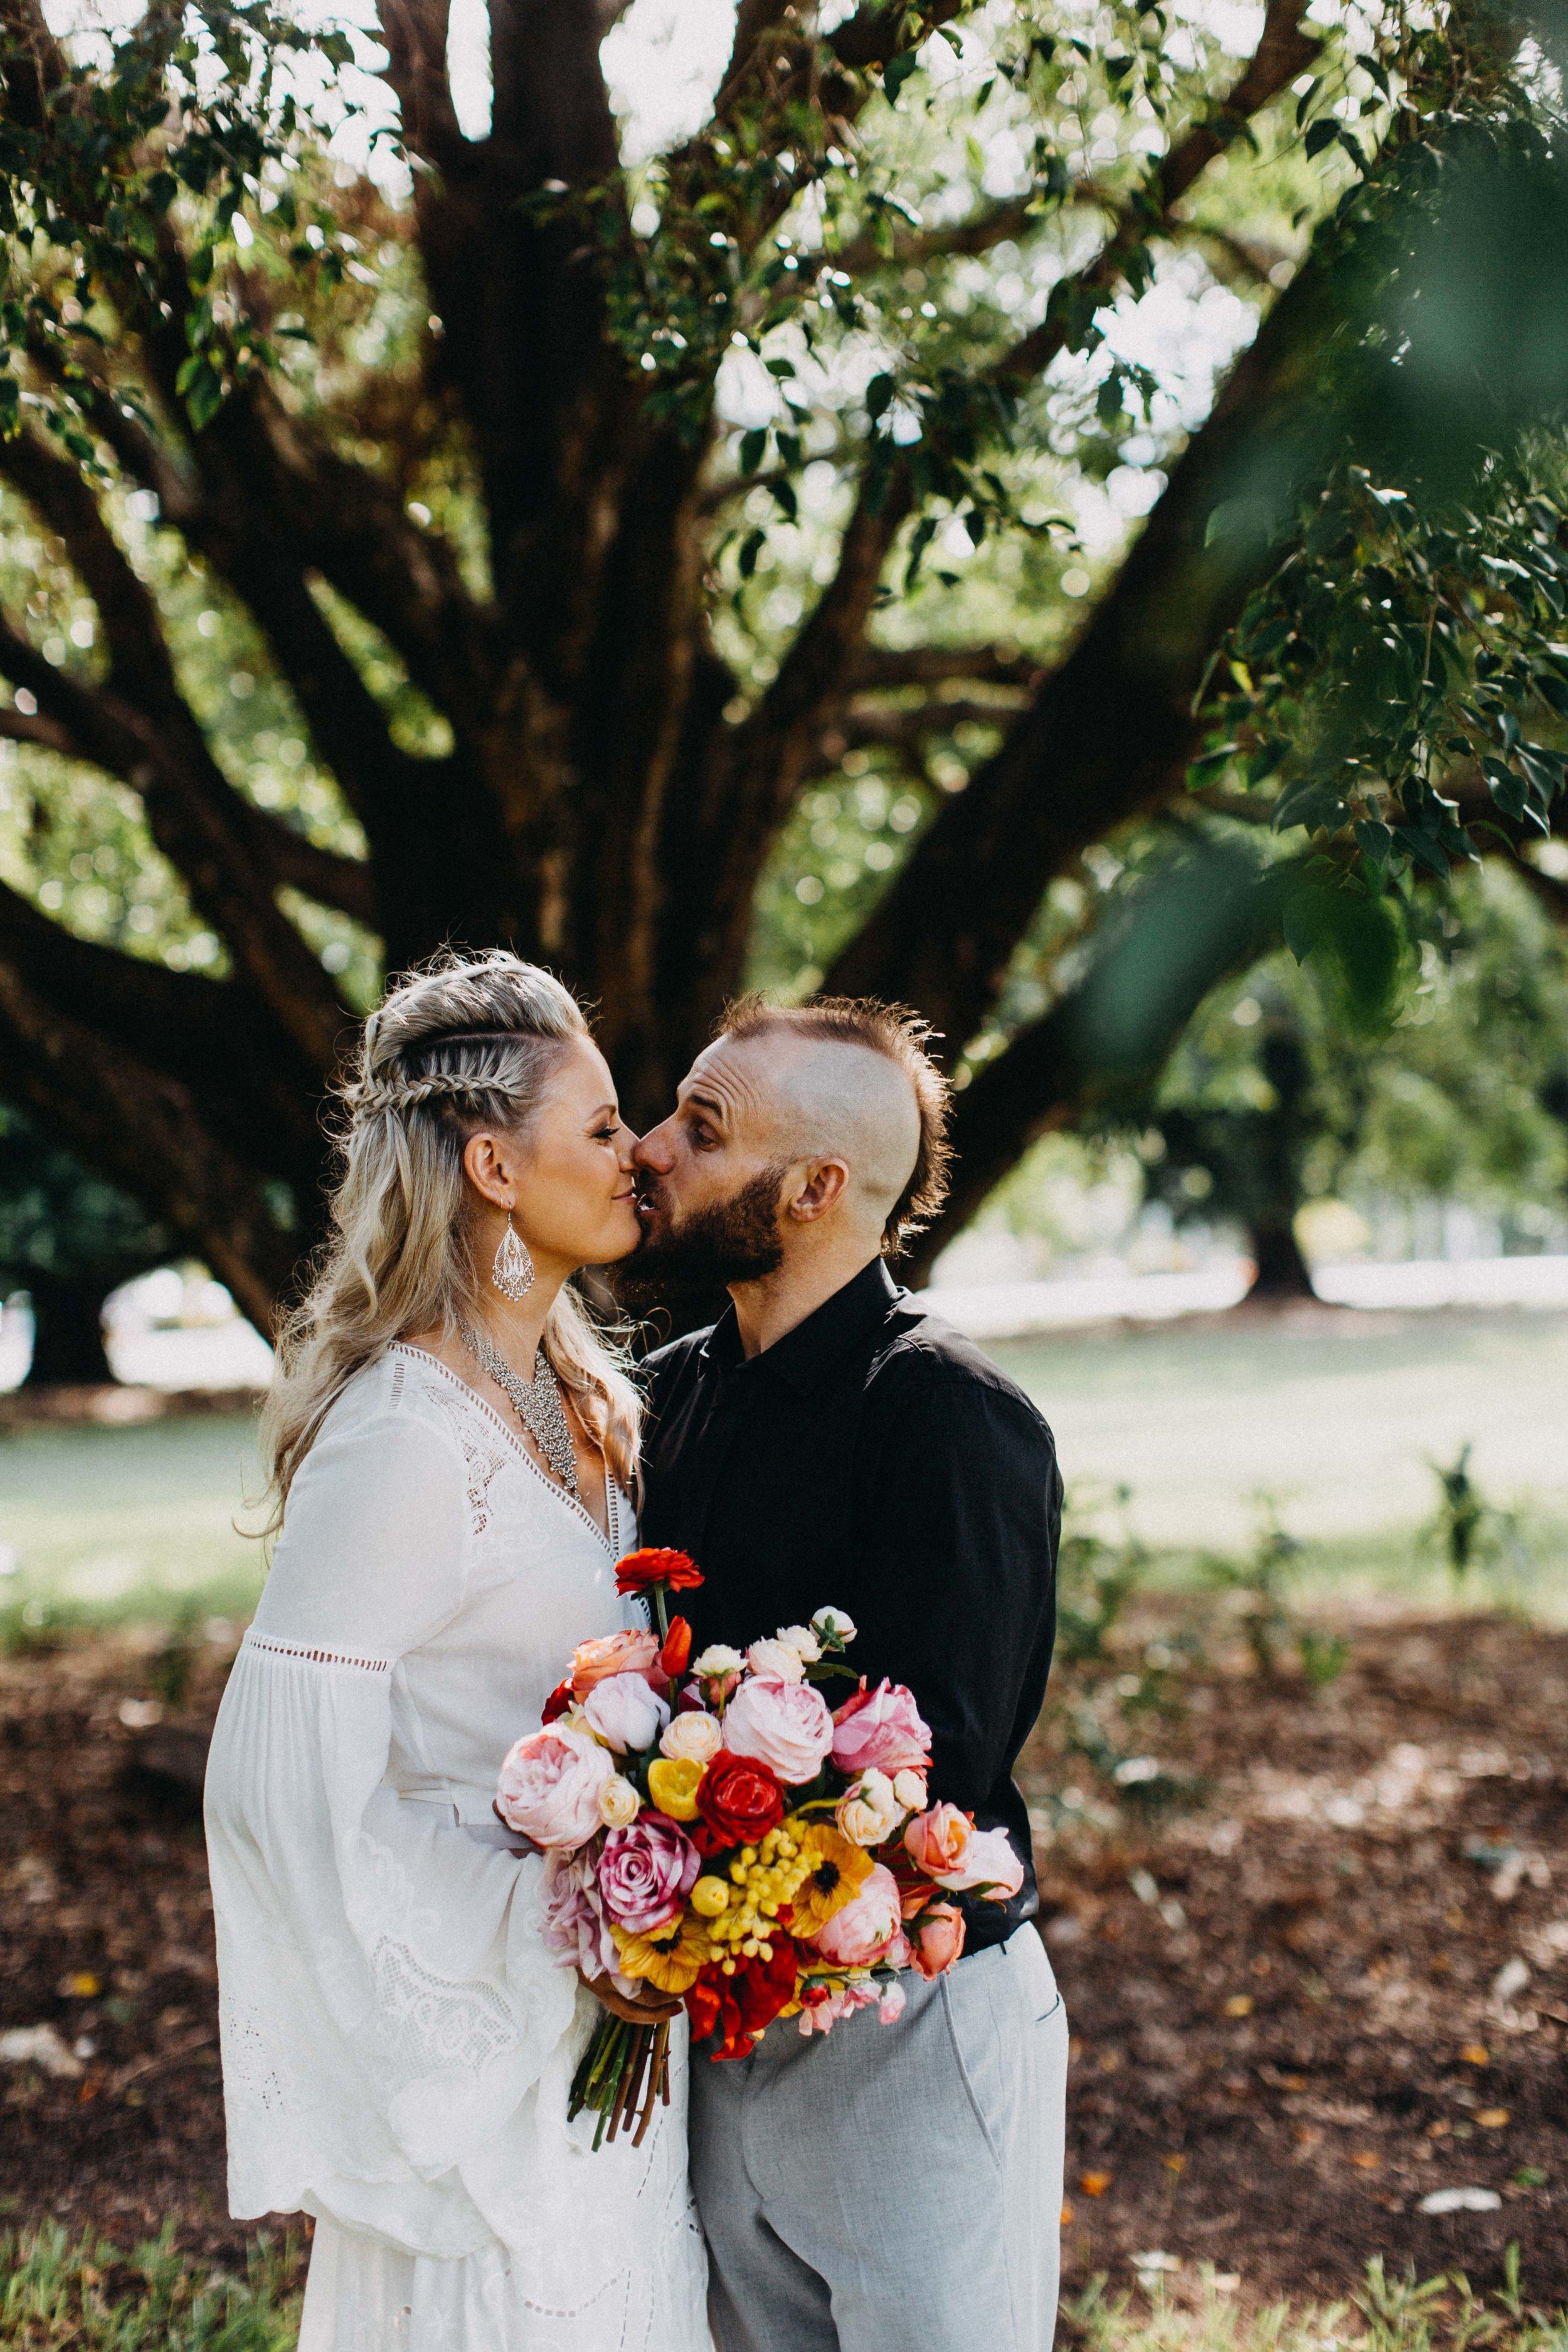 darwin-elopement-wedding-beach-camden-photography-www.emilyobrienphotography.net-28.jpg